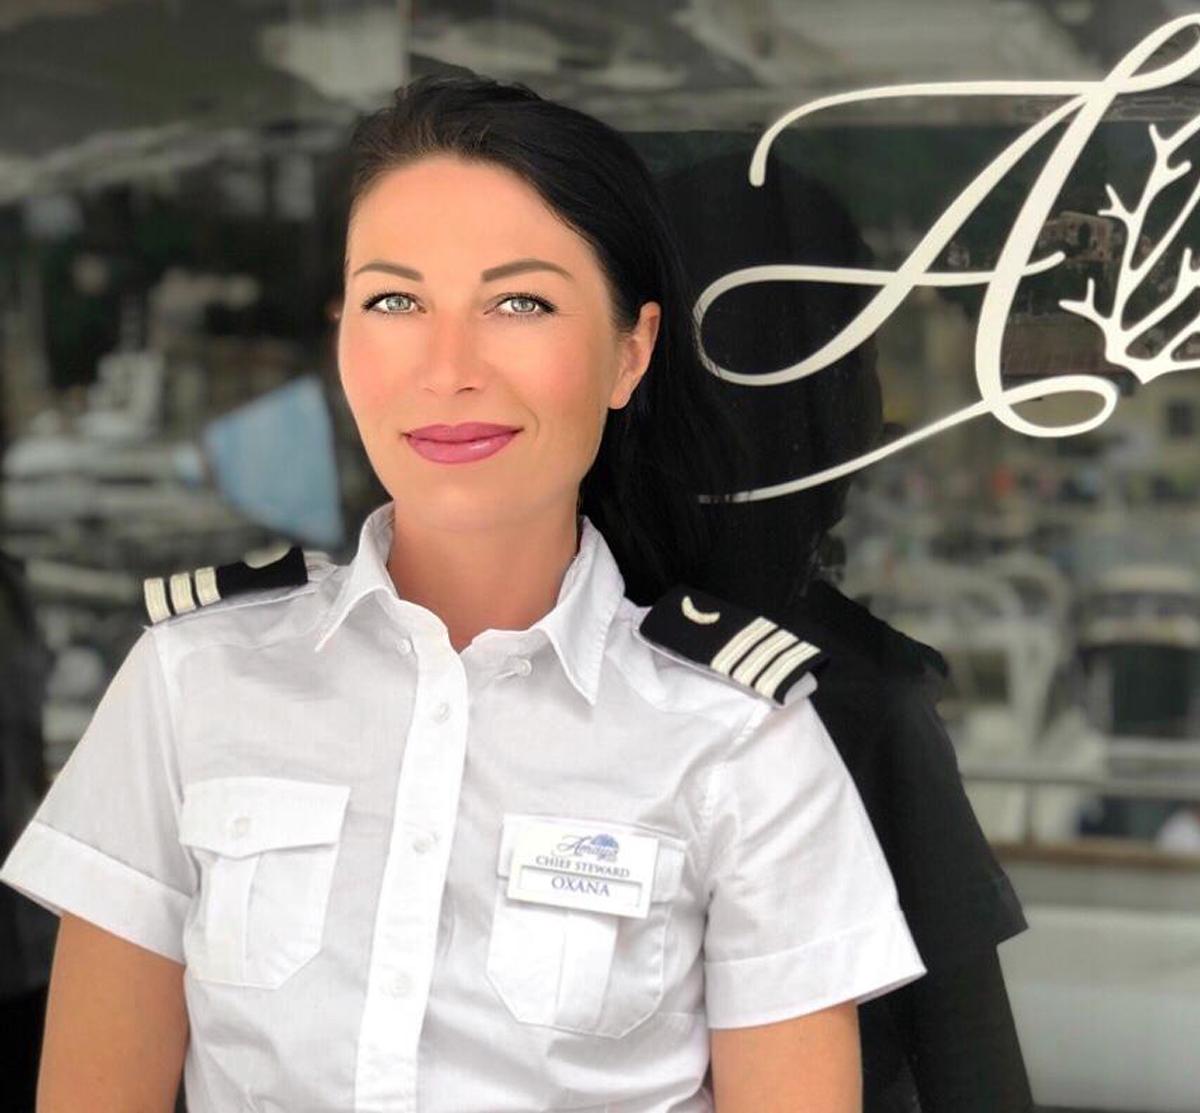 https://www.amayayacht.com/wp-content/uploads/2019/06/Oxana.jpg